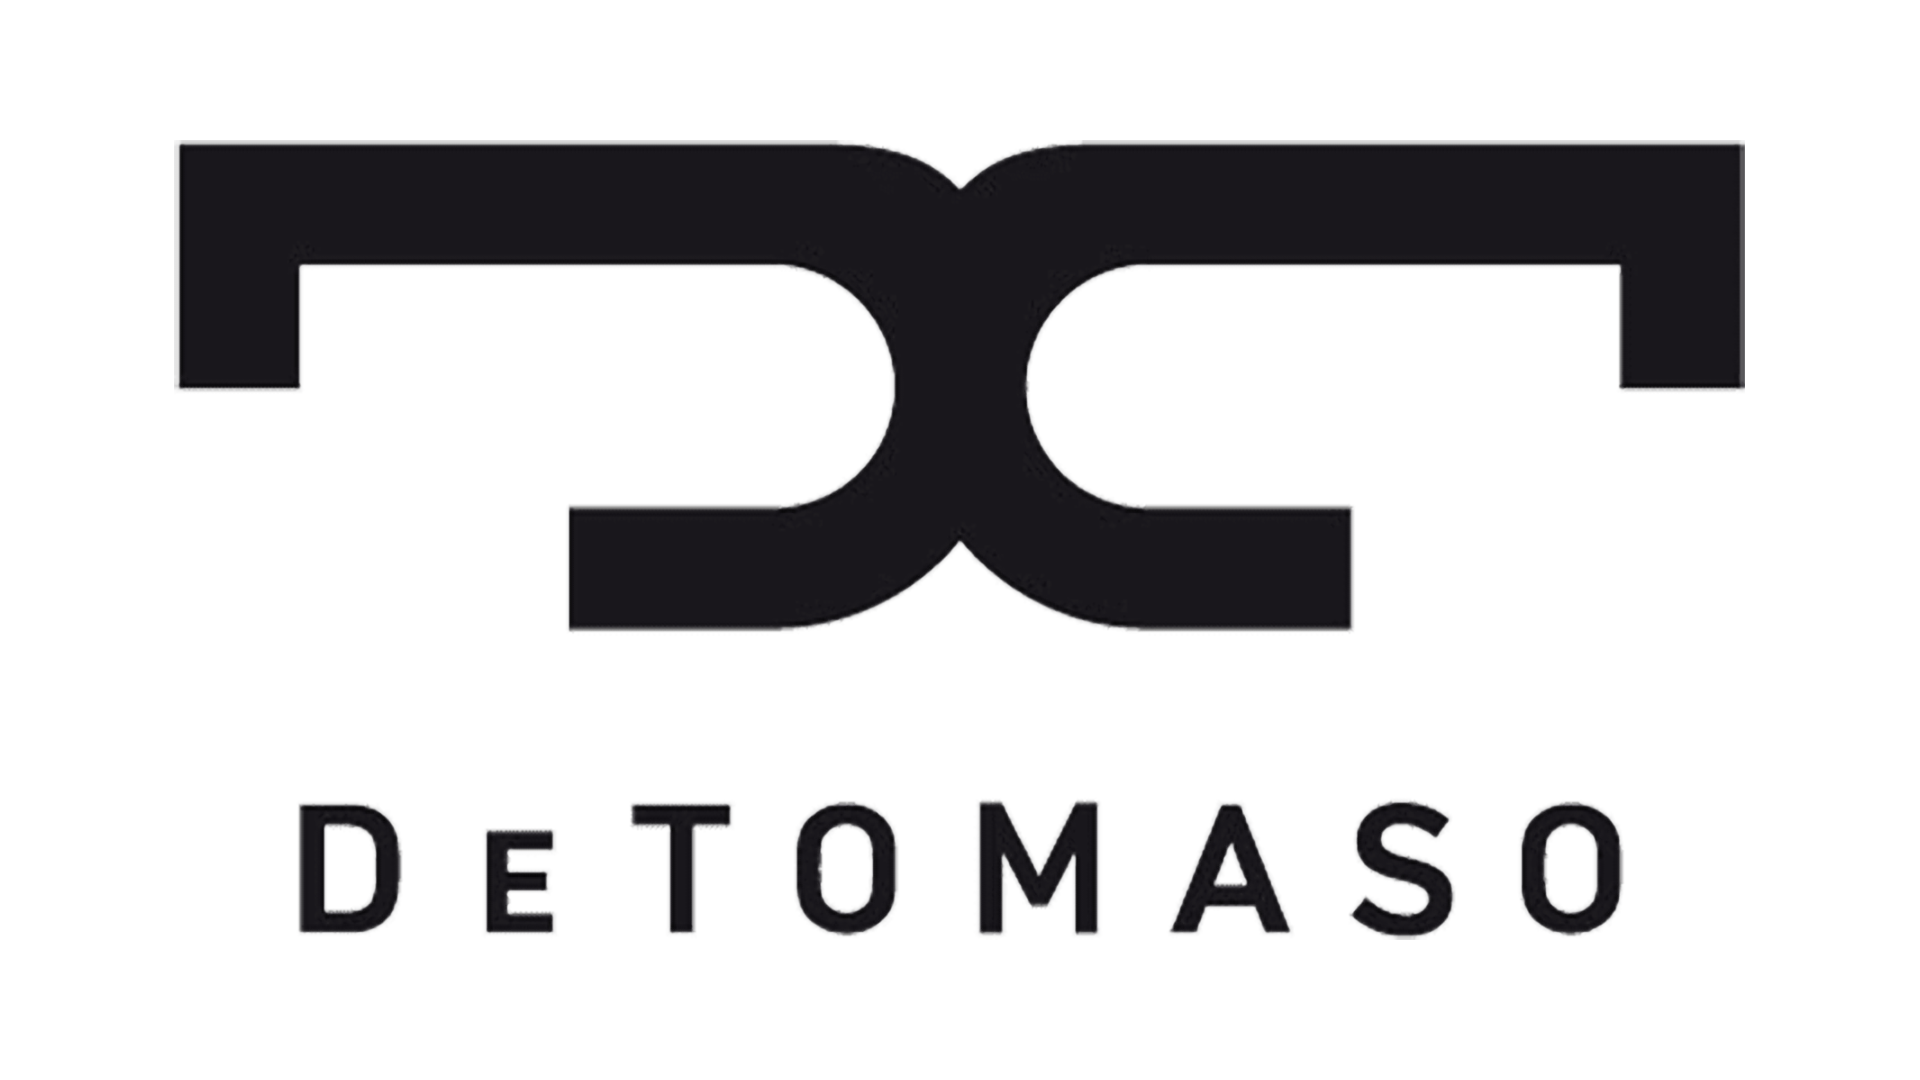 Логотип De Tomaso